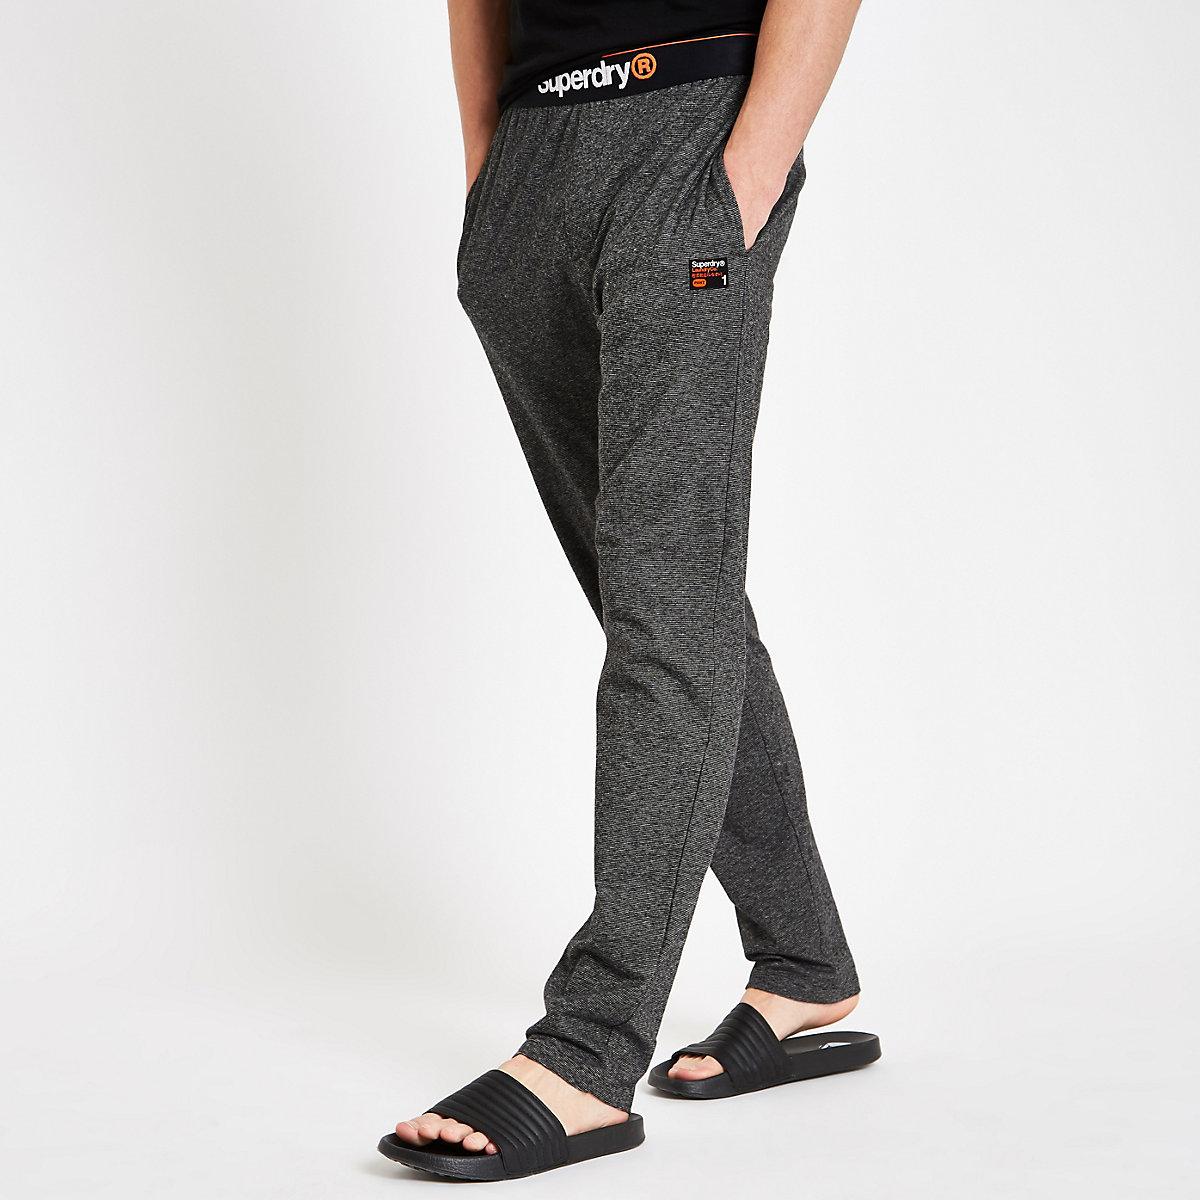 Superdry grey loungewear trousers